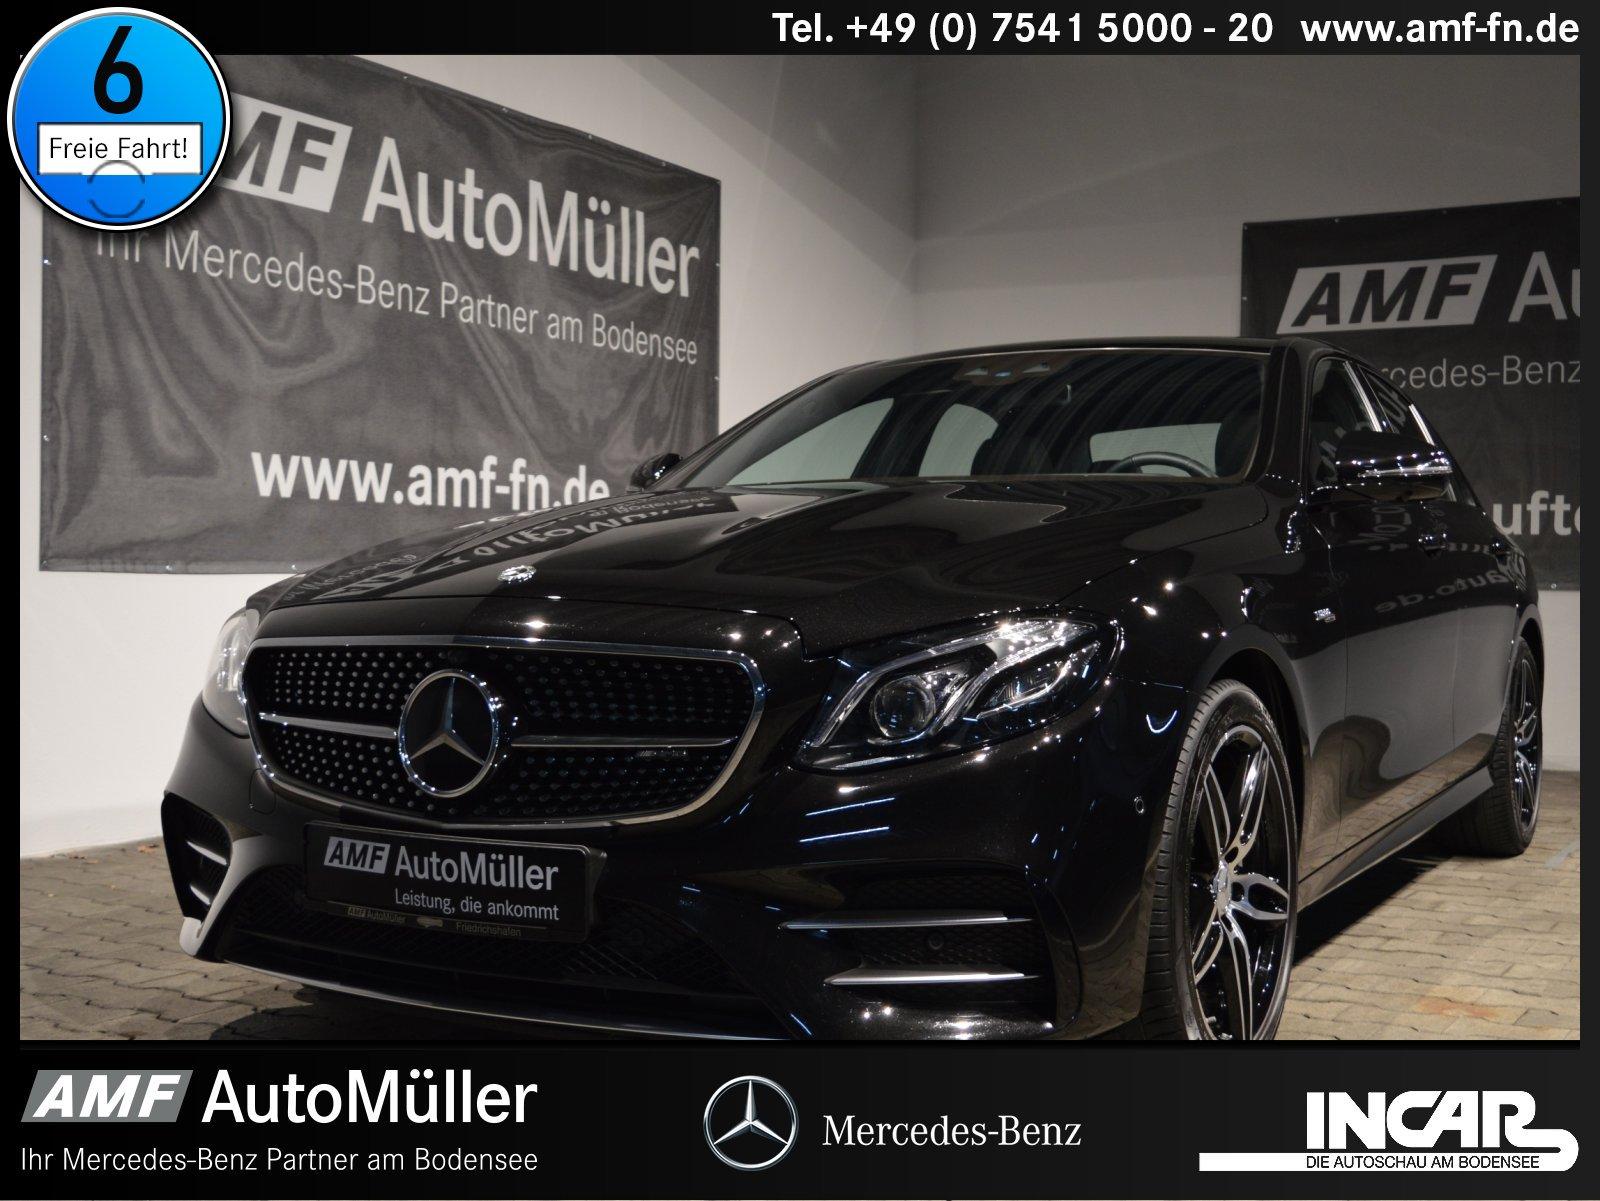 Mercedes-Benz Mercedes-AMG E 53 4M+ PANO+COMAND+360°+DISTRO+, Jahr 2020, Benzin